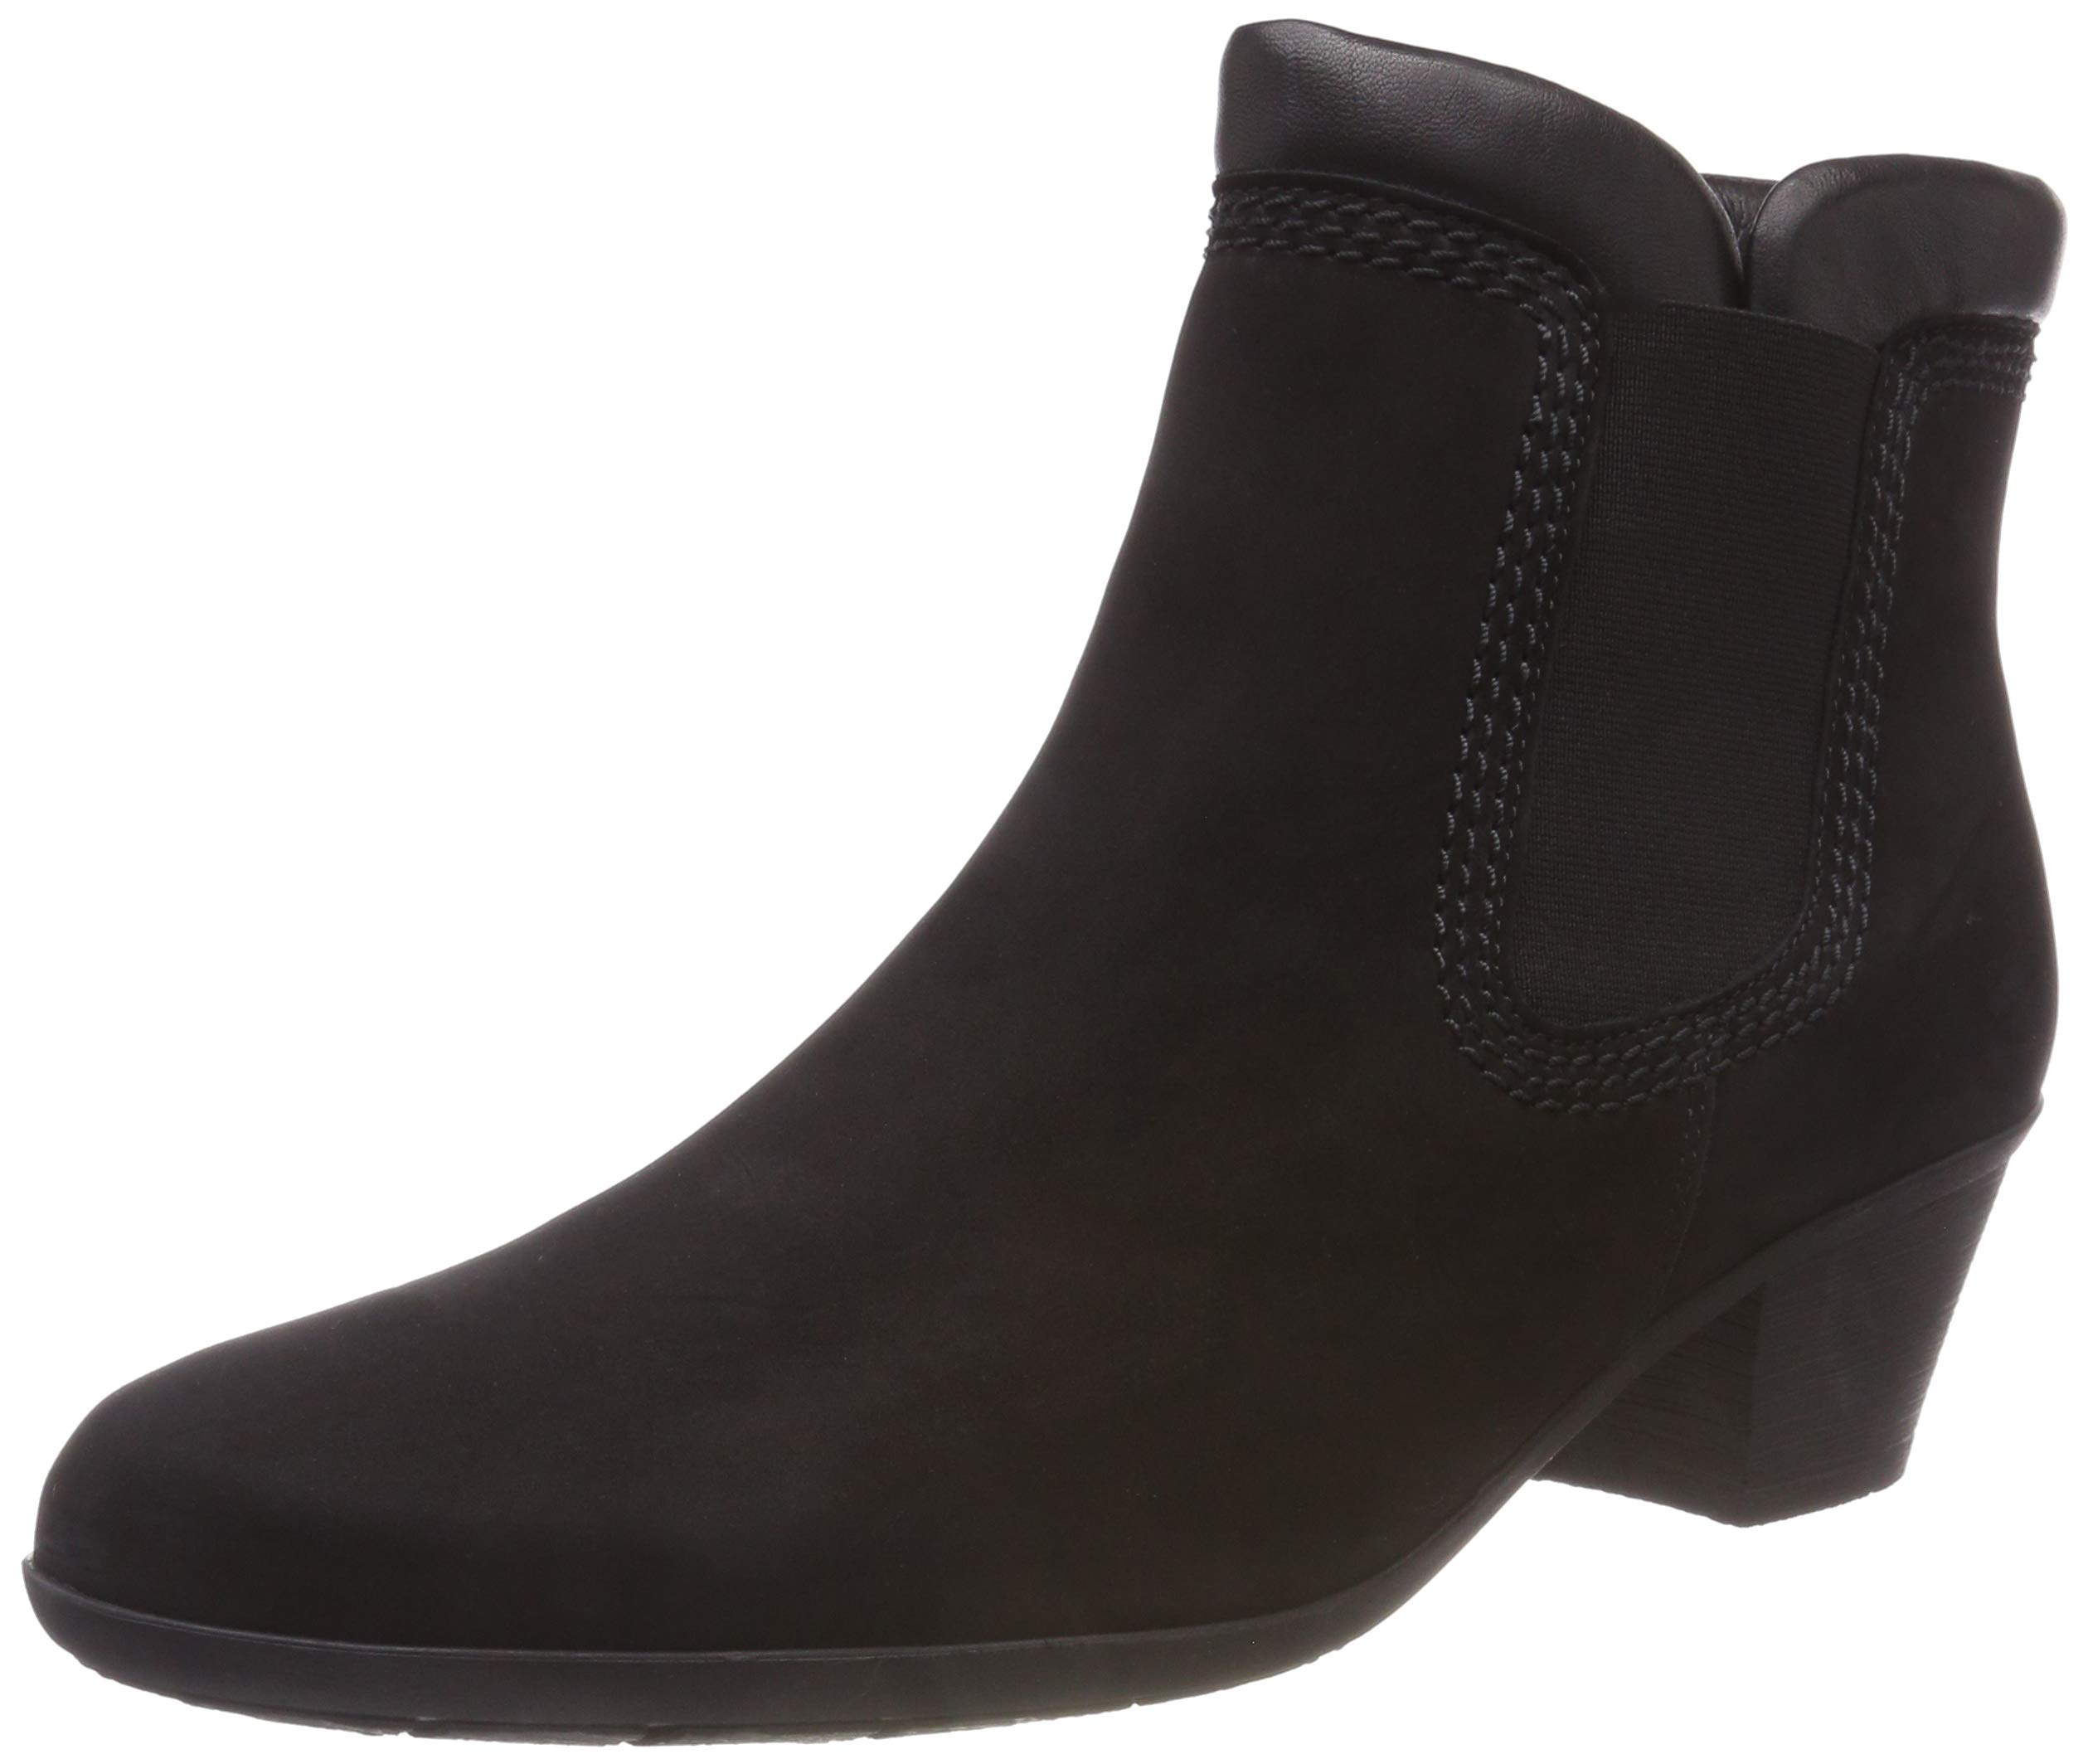 CasualBotines Gabor FemmeNoirschwarz 1738 Shoes Eu 2WHIY9eED